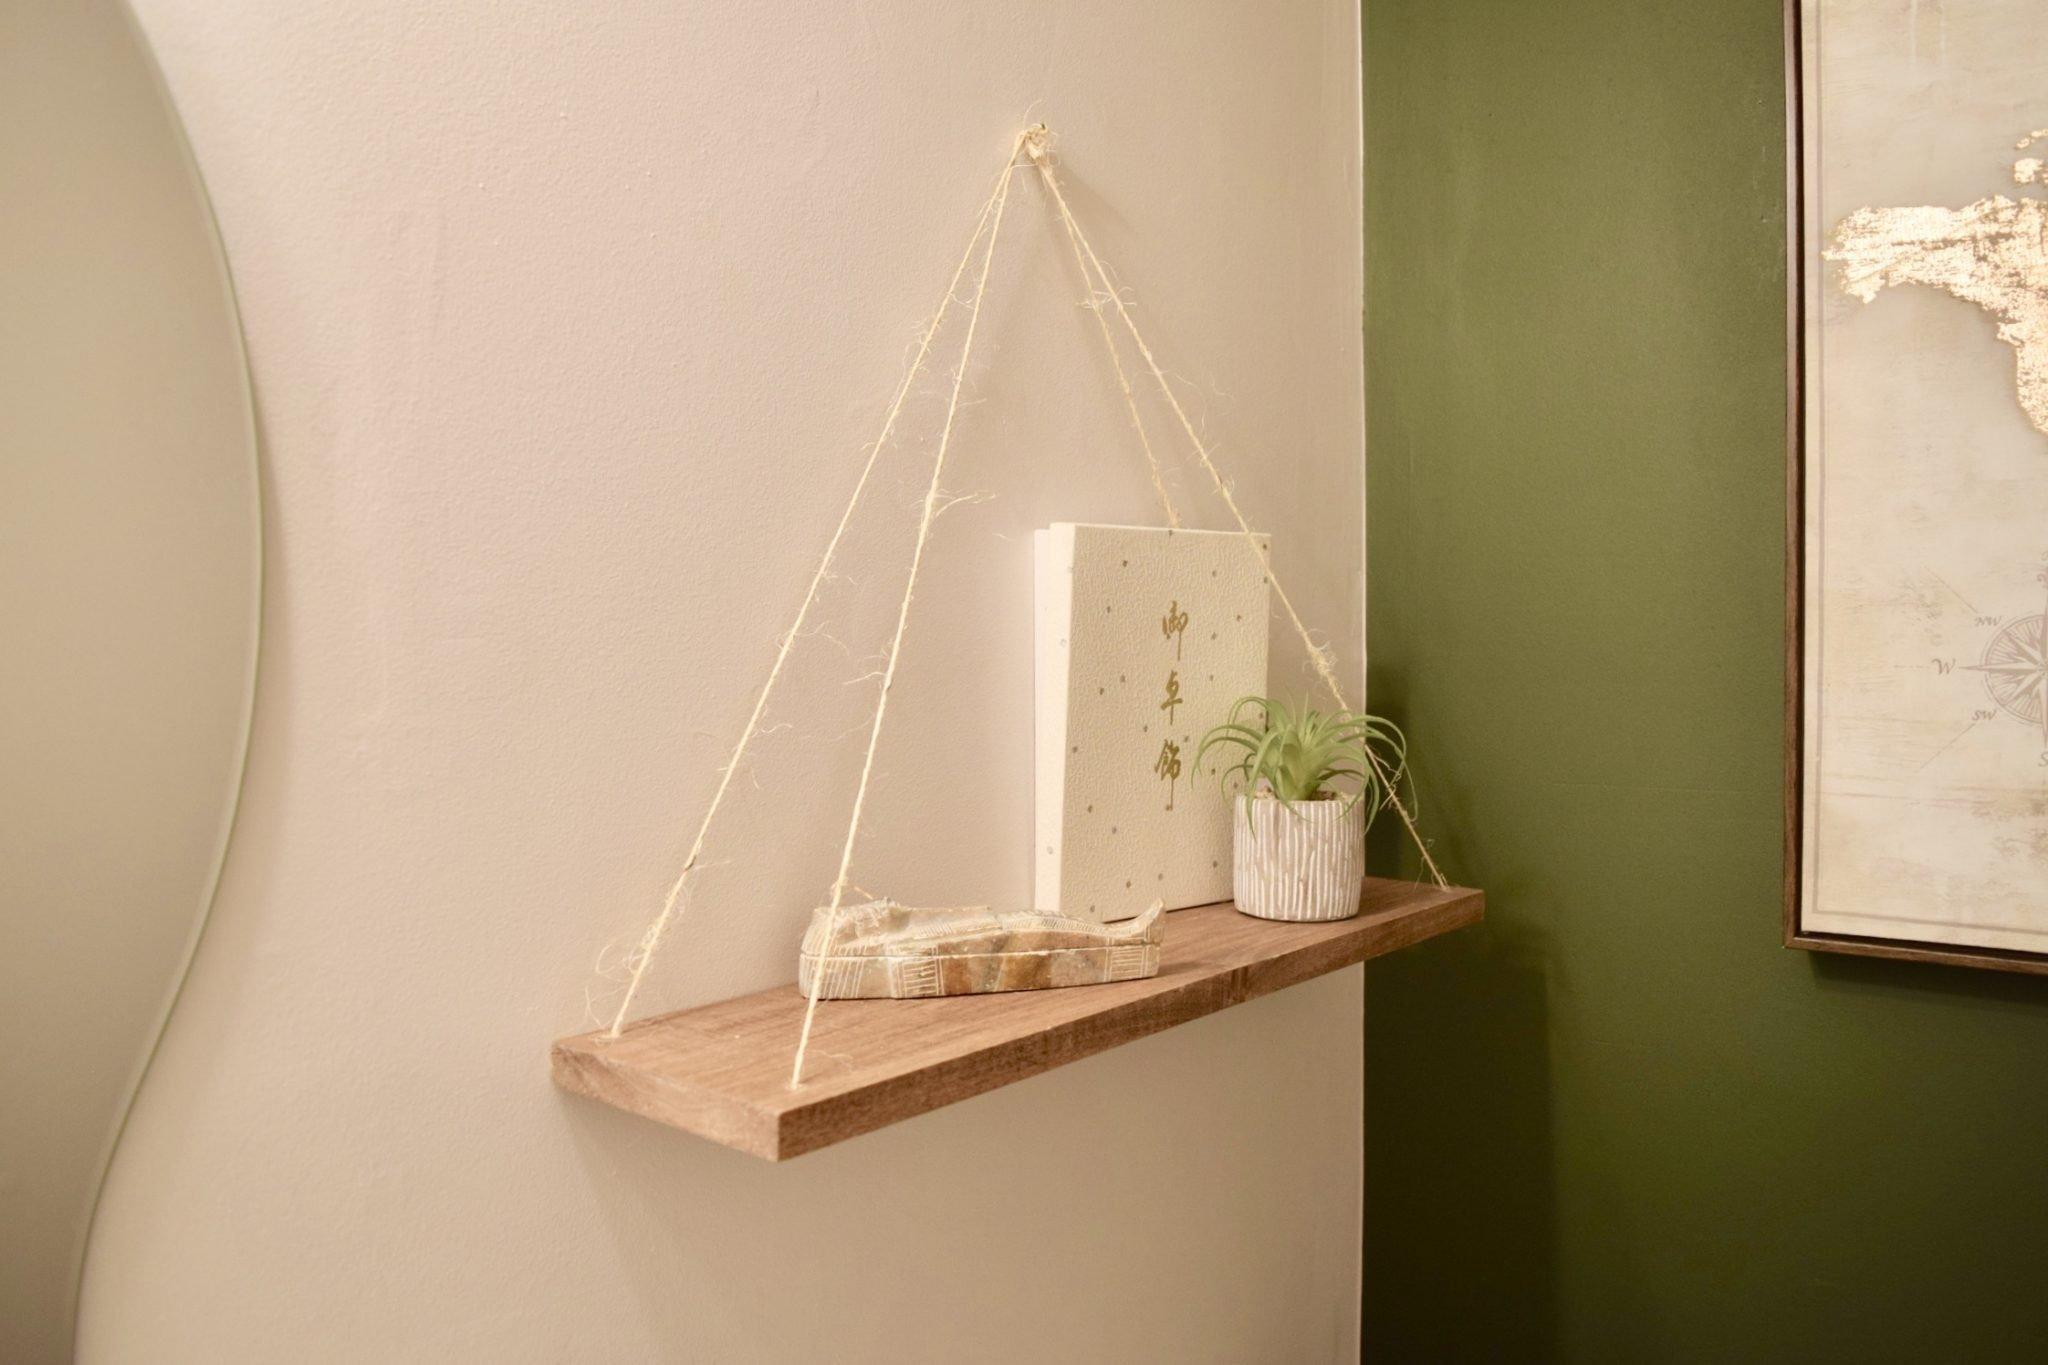 Hanging a Rope Shelf